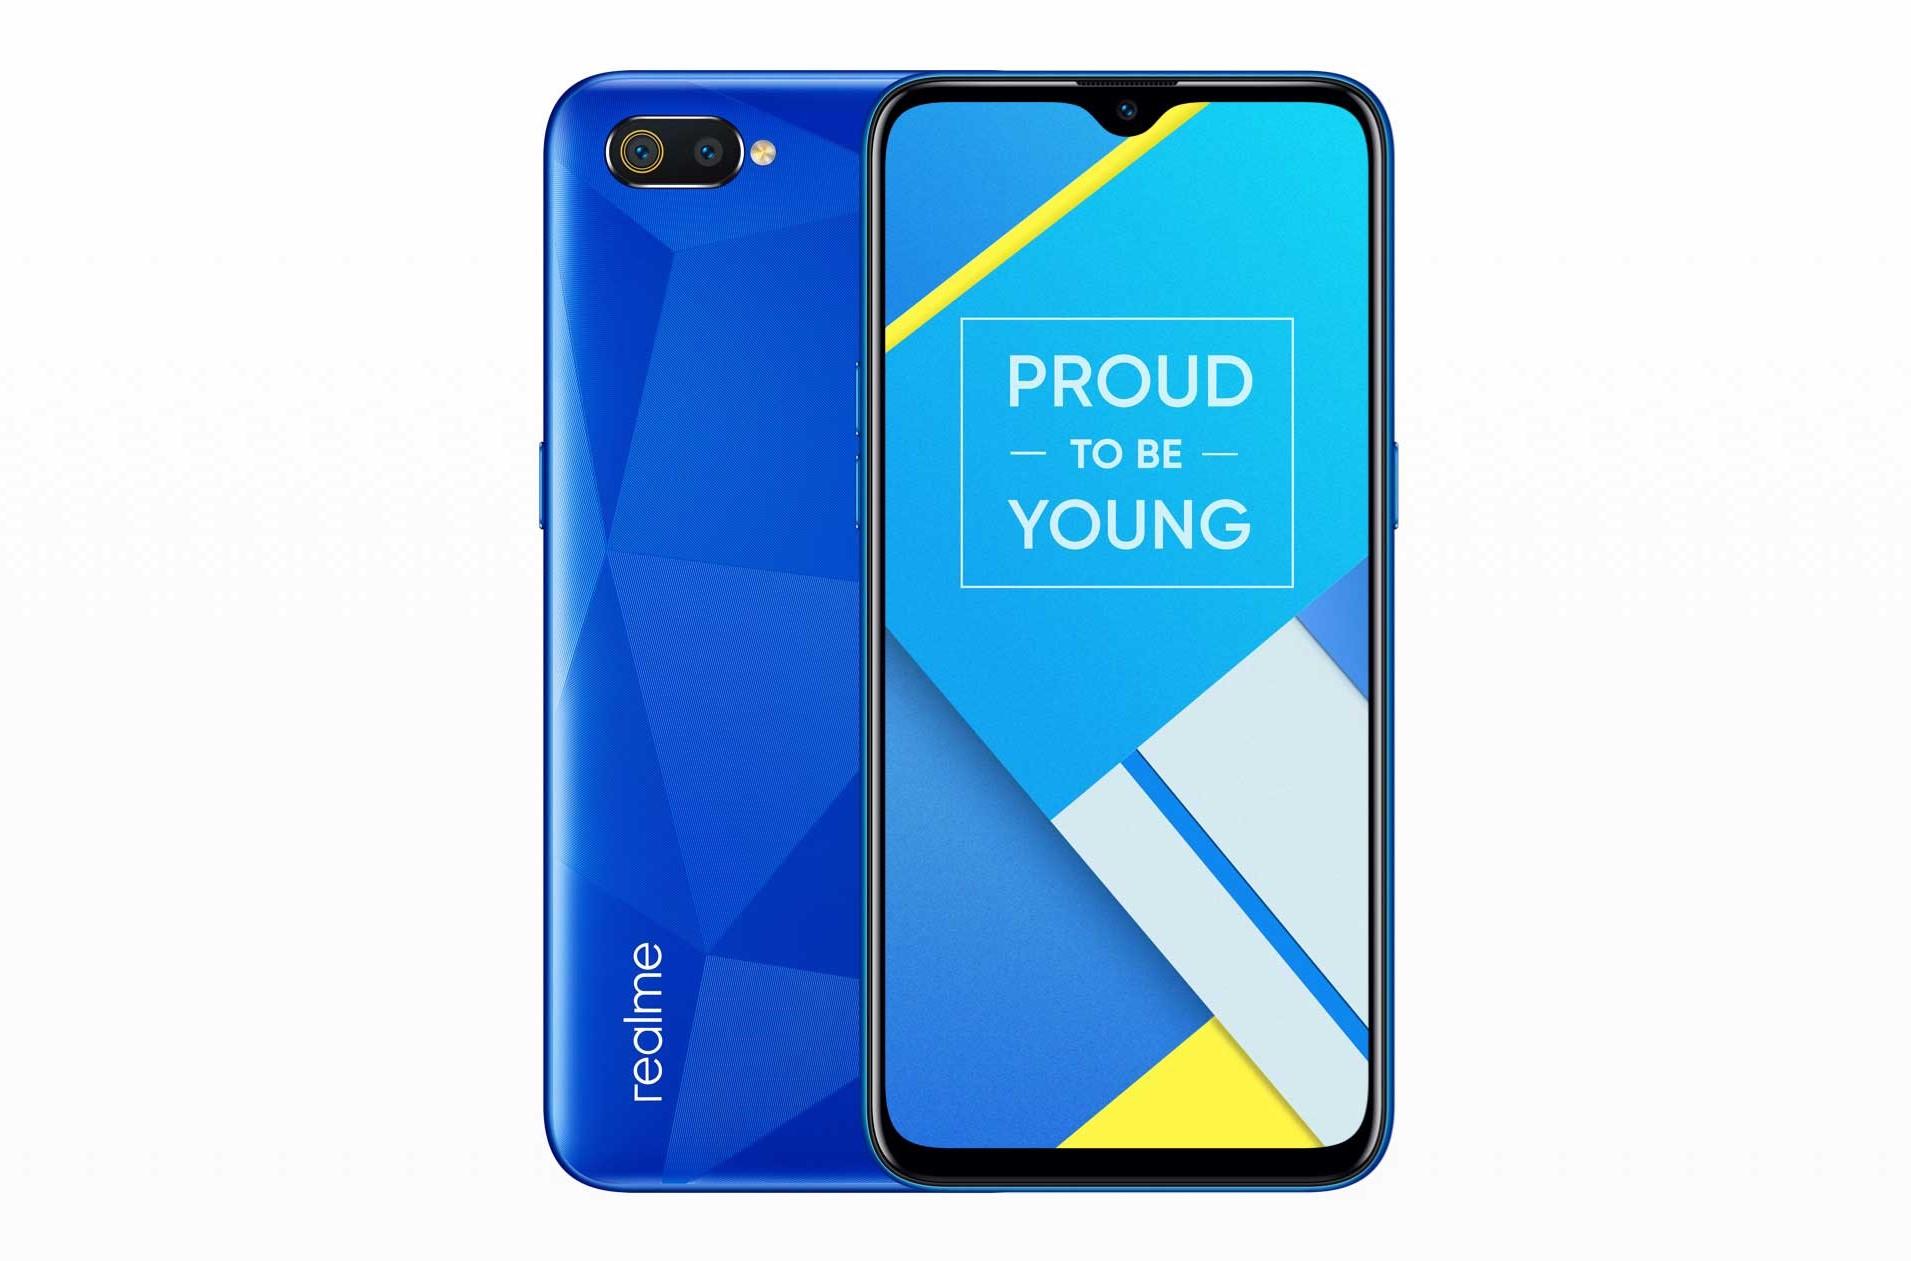 The Realme C2's Desh Ka Real Choice tagline was heavily inspired by Redmi's Desh Ka Smartphone tagline.